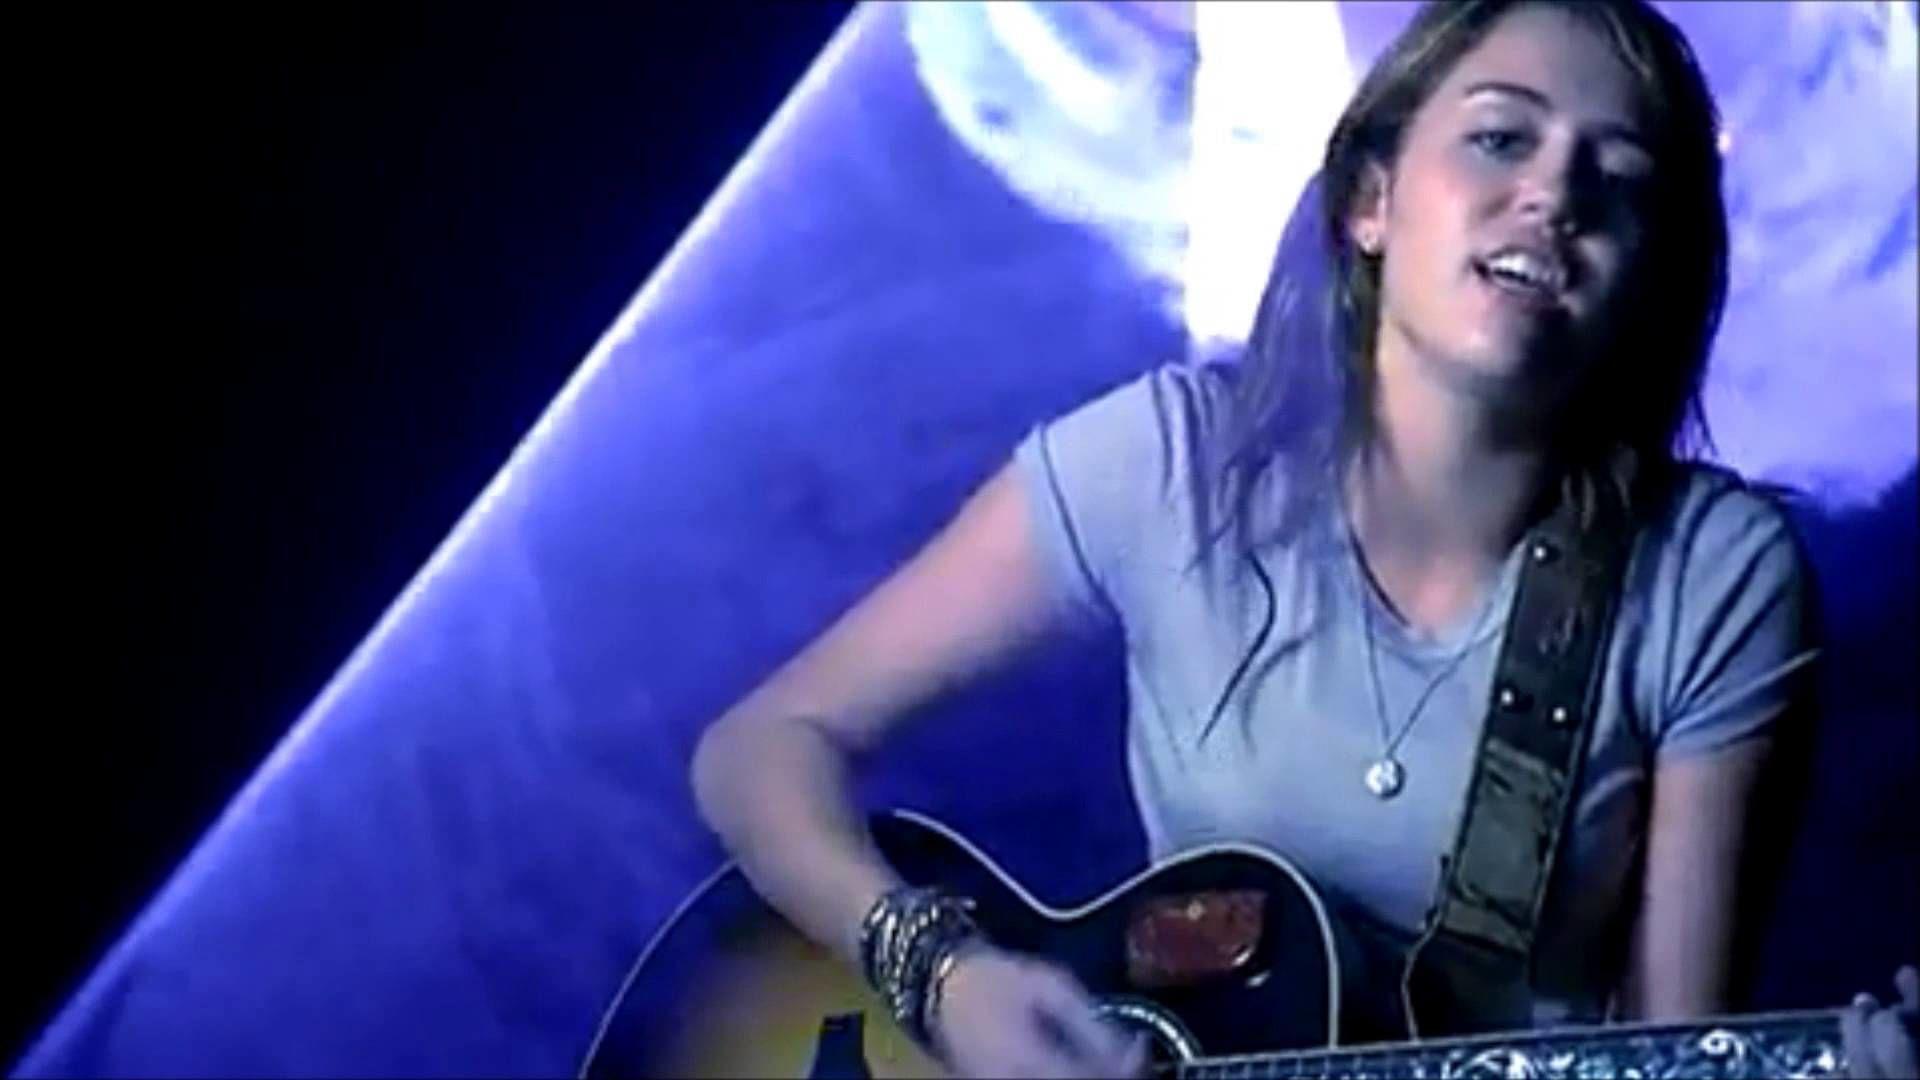 7. Miley Cyrus - Climb